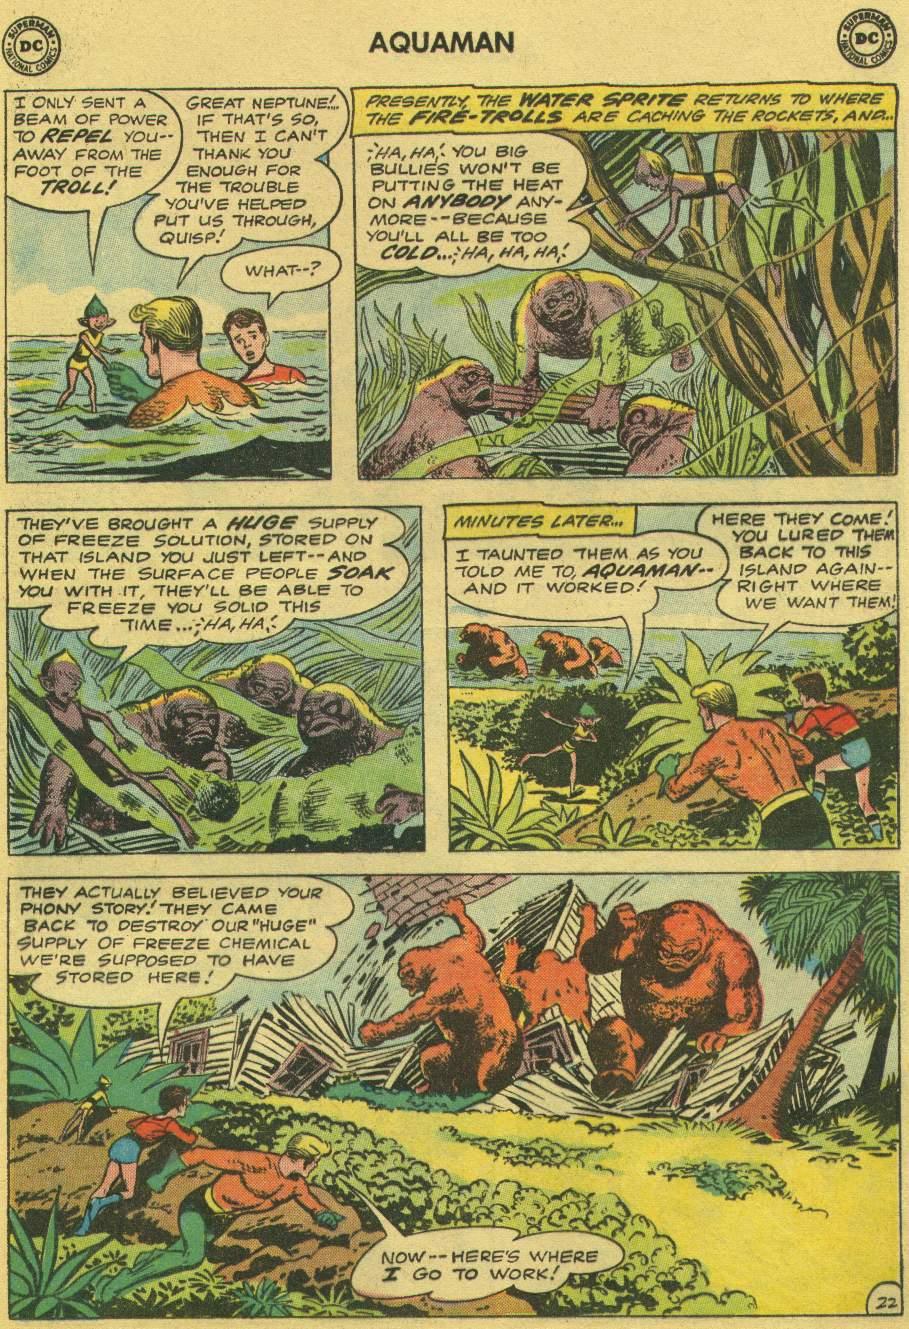 Read online Aquaman (1962) comic -  Issue #1 - 29